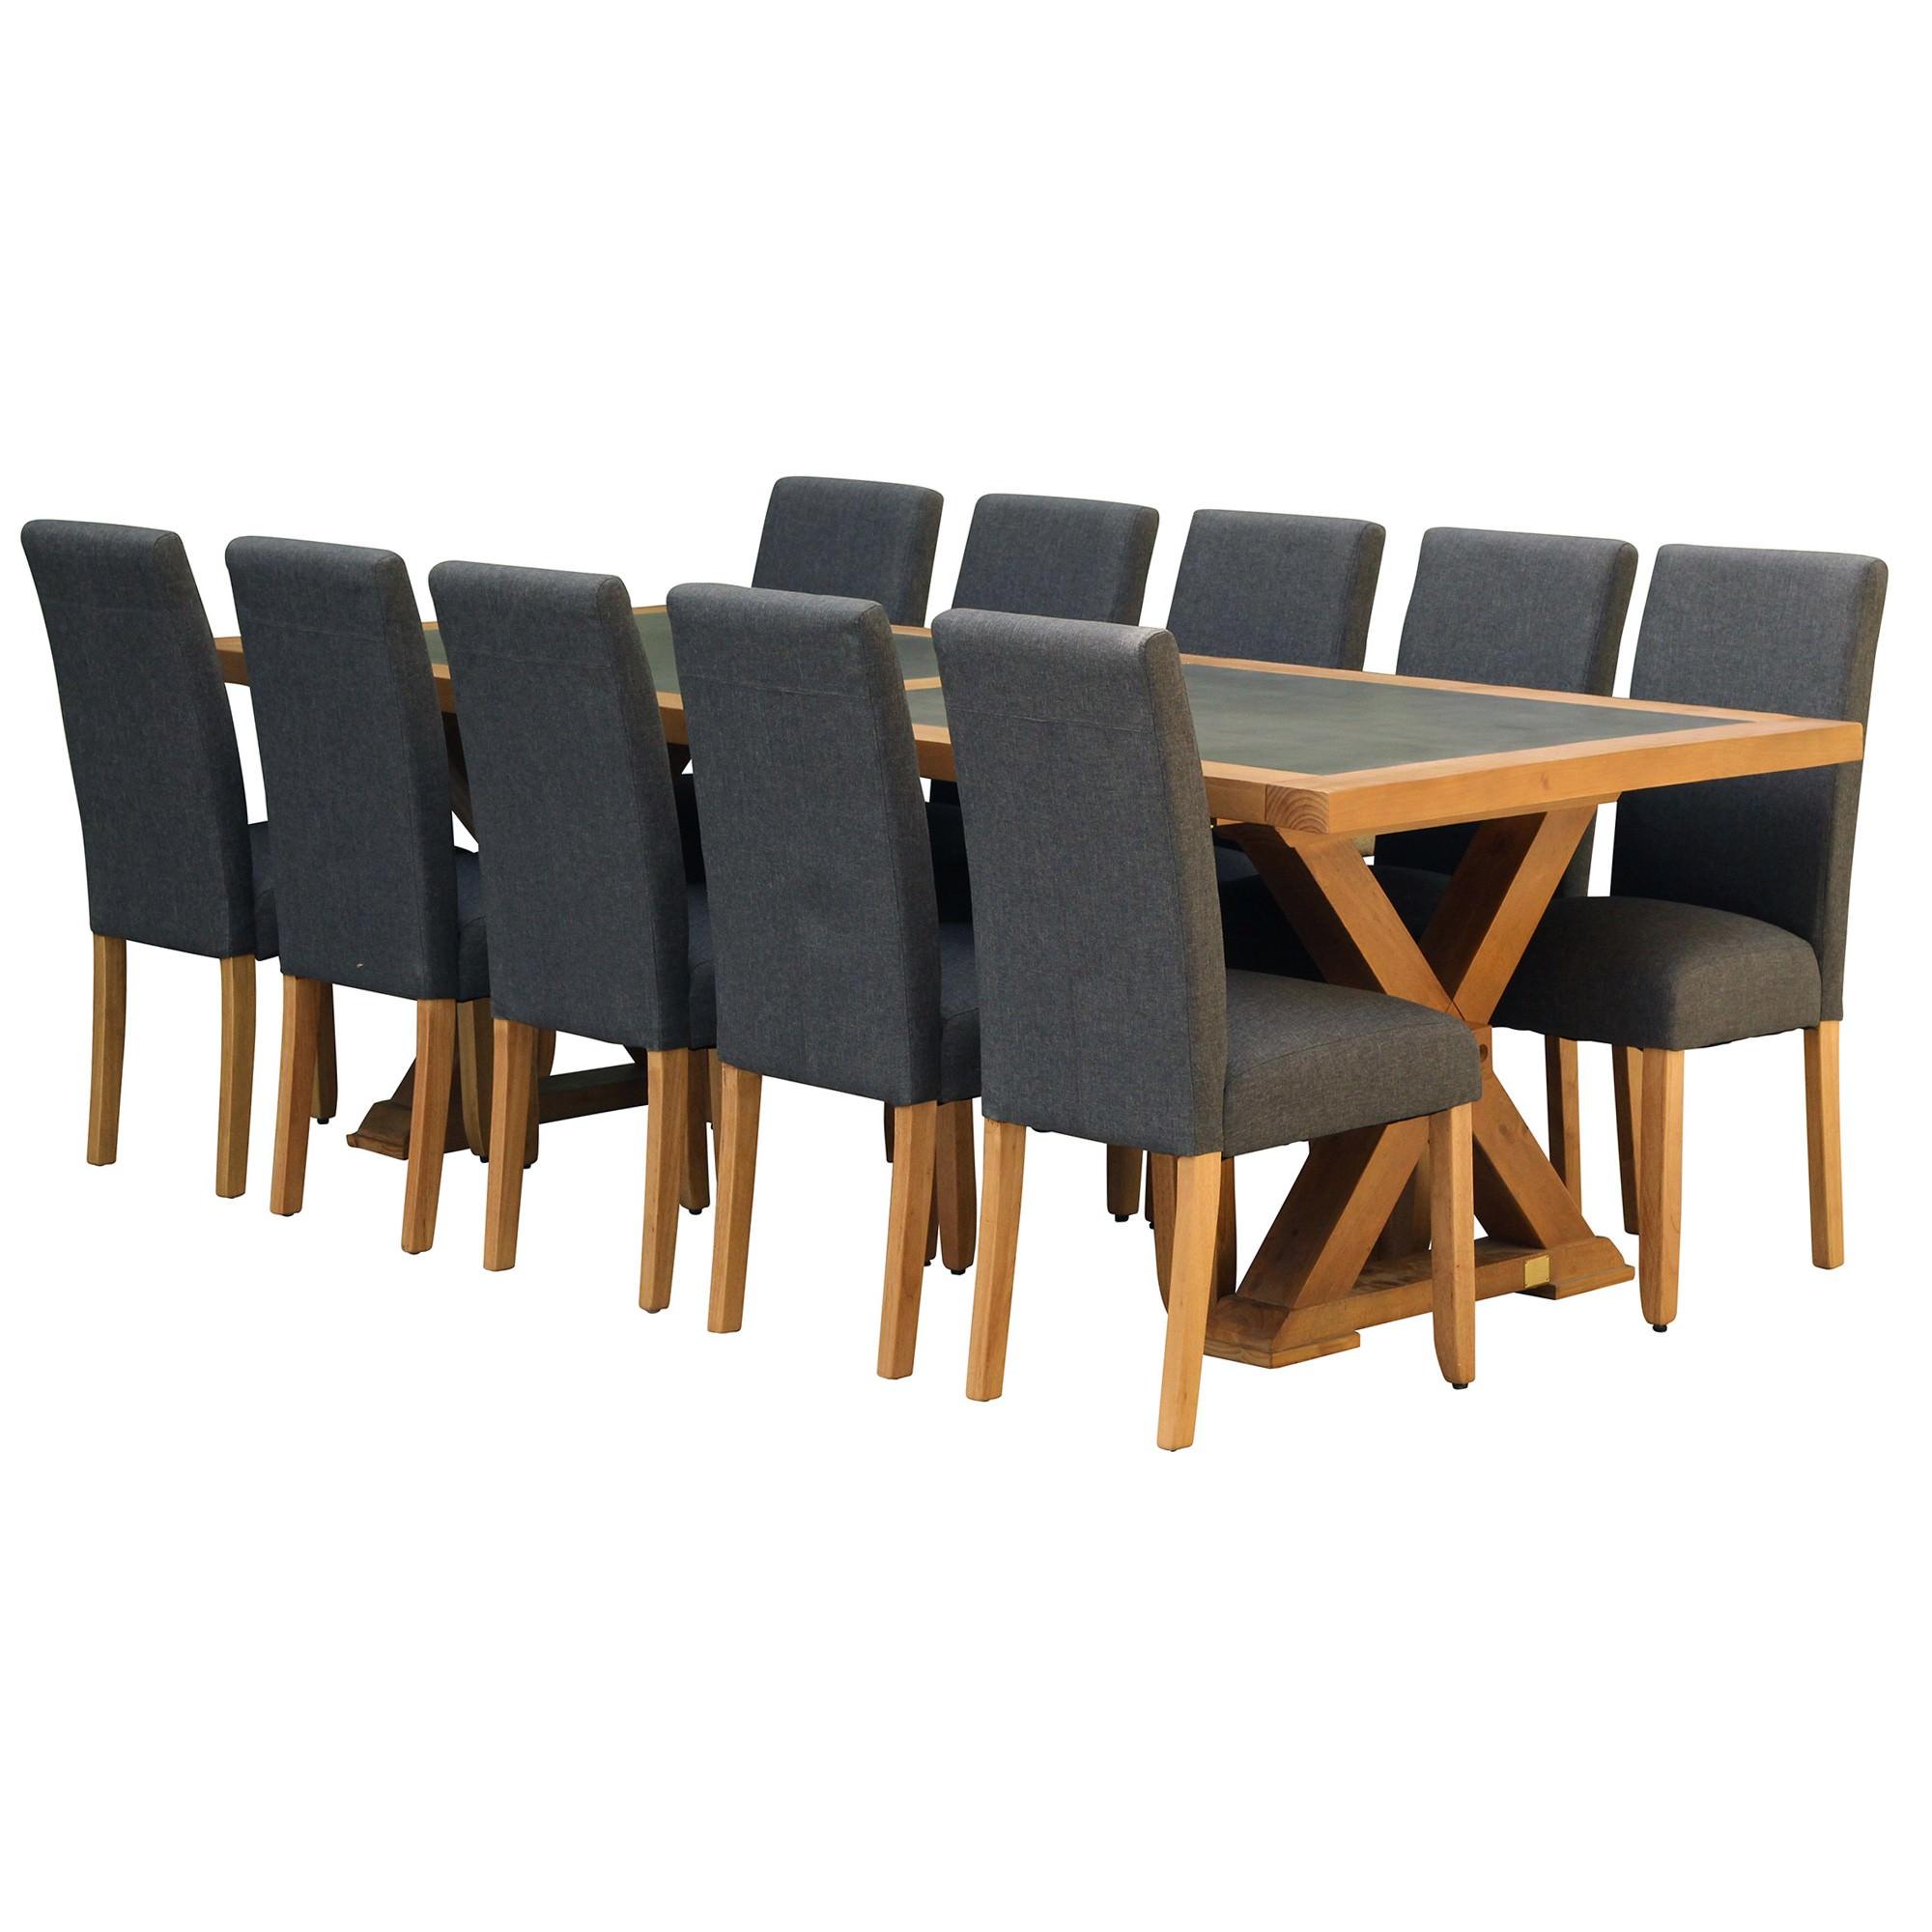 Sefton 11 Piece Pine Timber Dining Table Set, 240cm, Dark Grey Arwen Chair